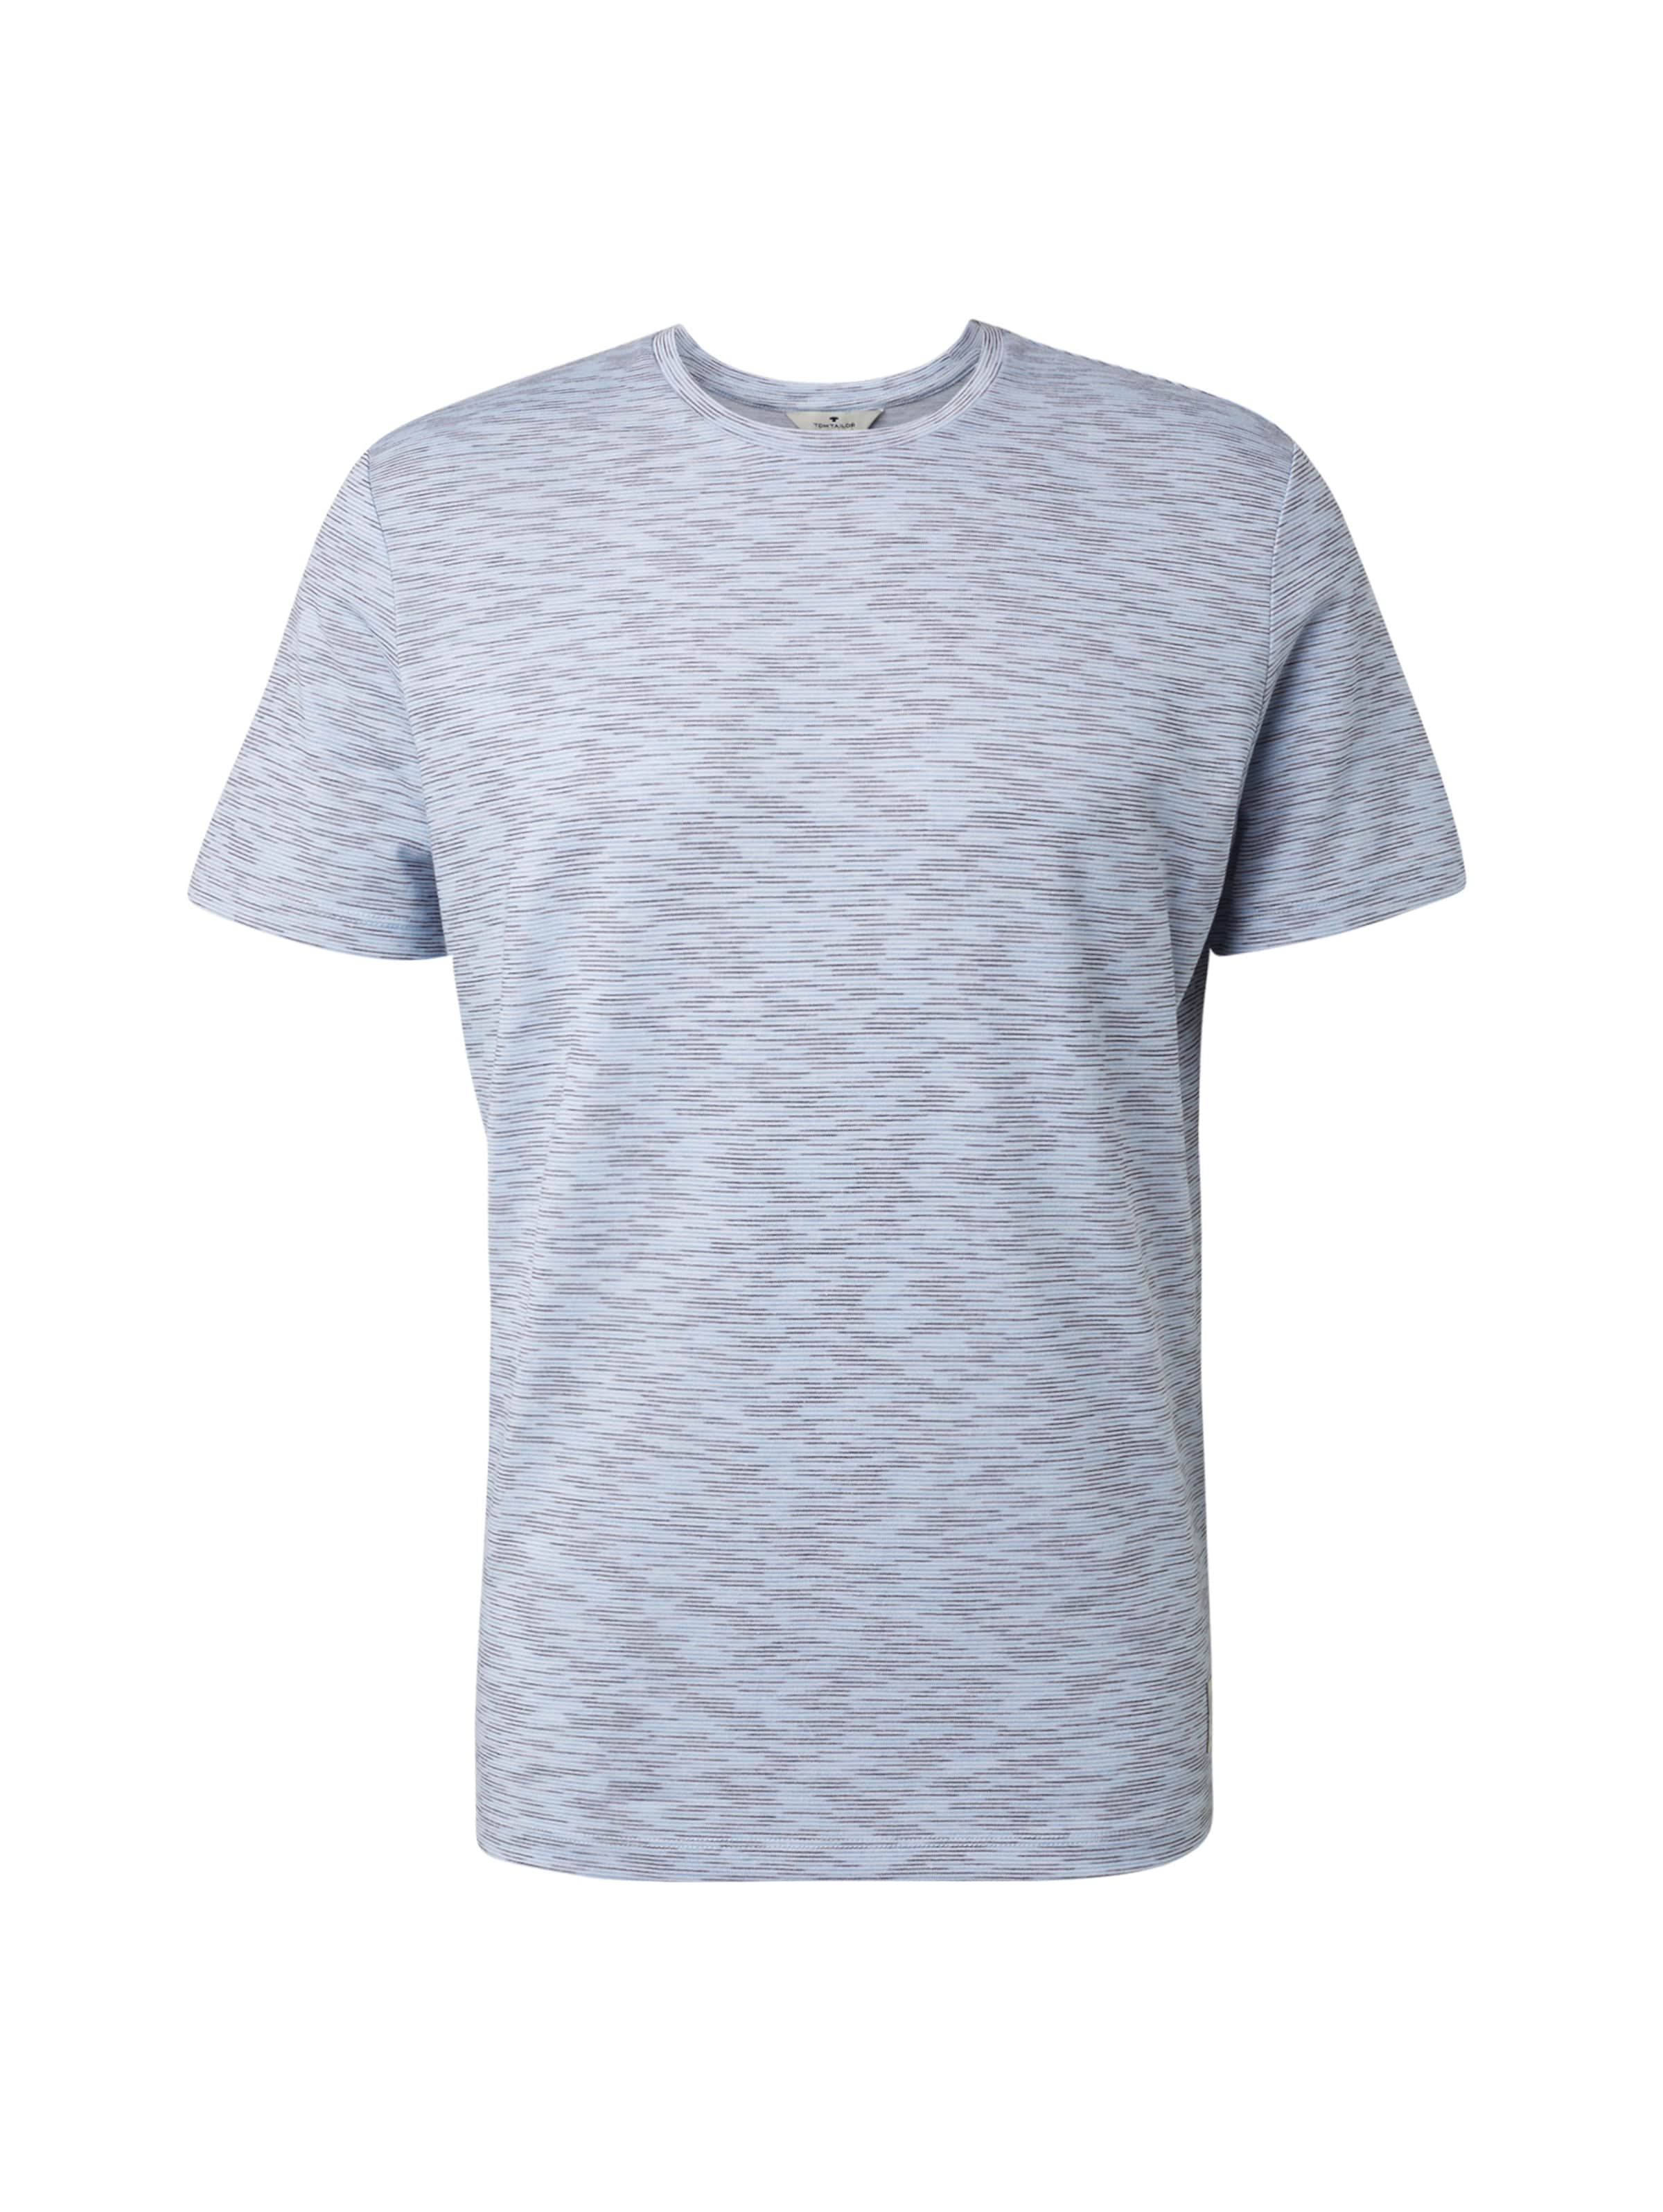 Tom T HellblauWeiß Tailor In shirt 354RqALj